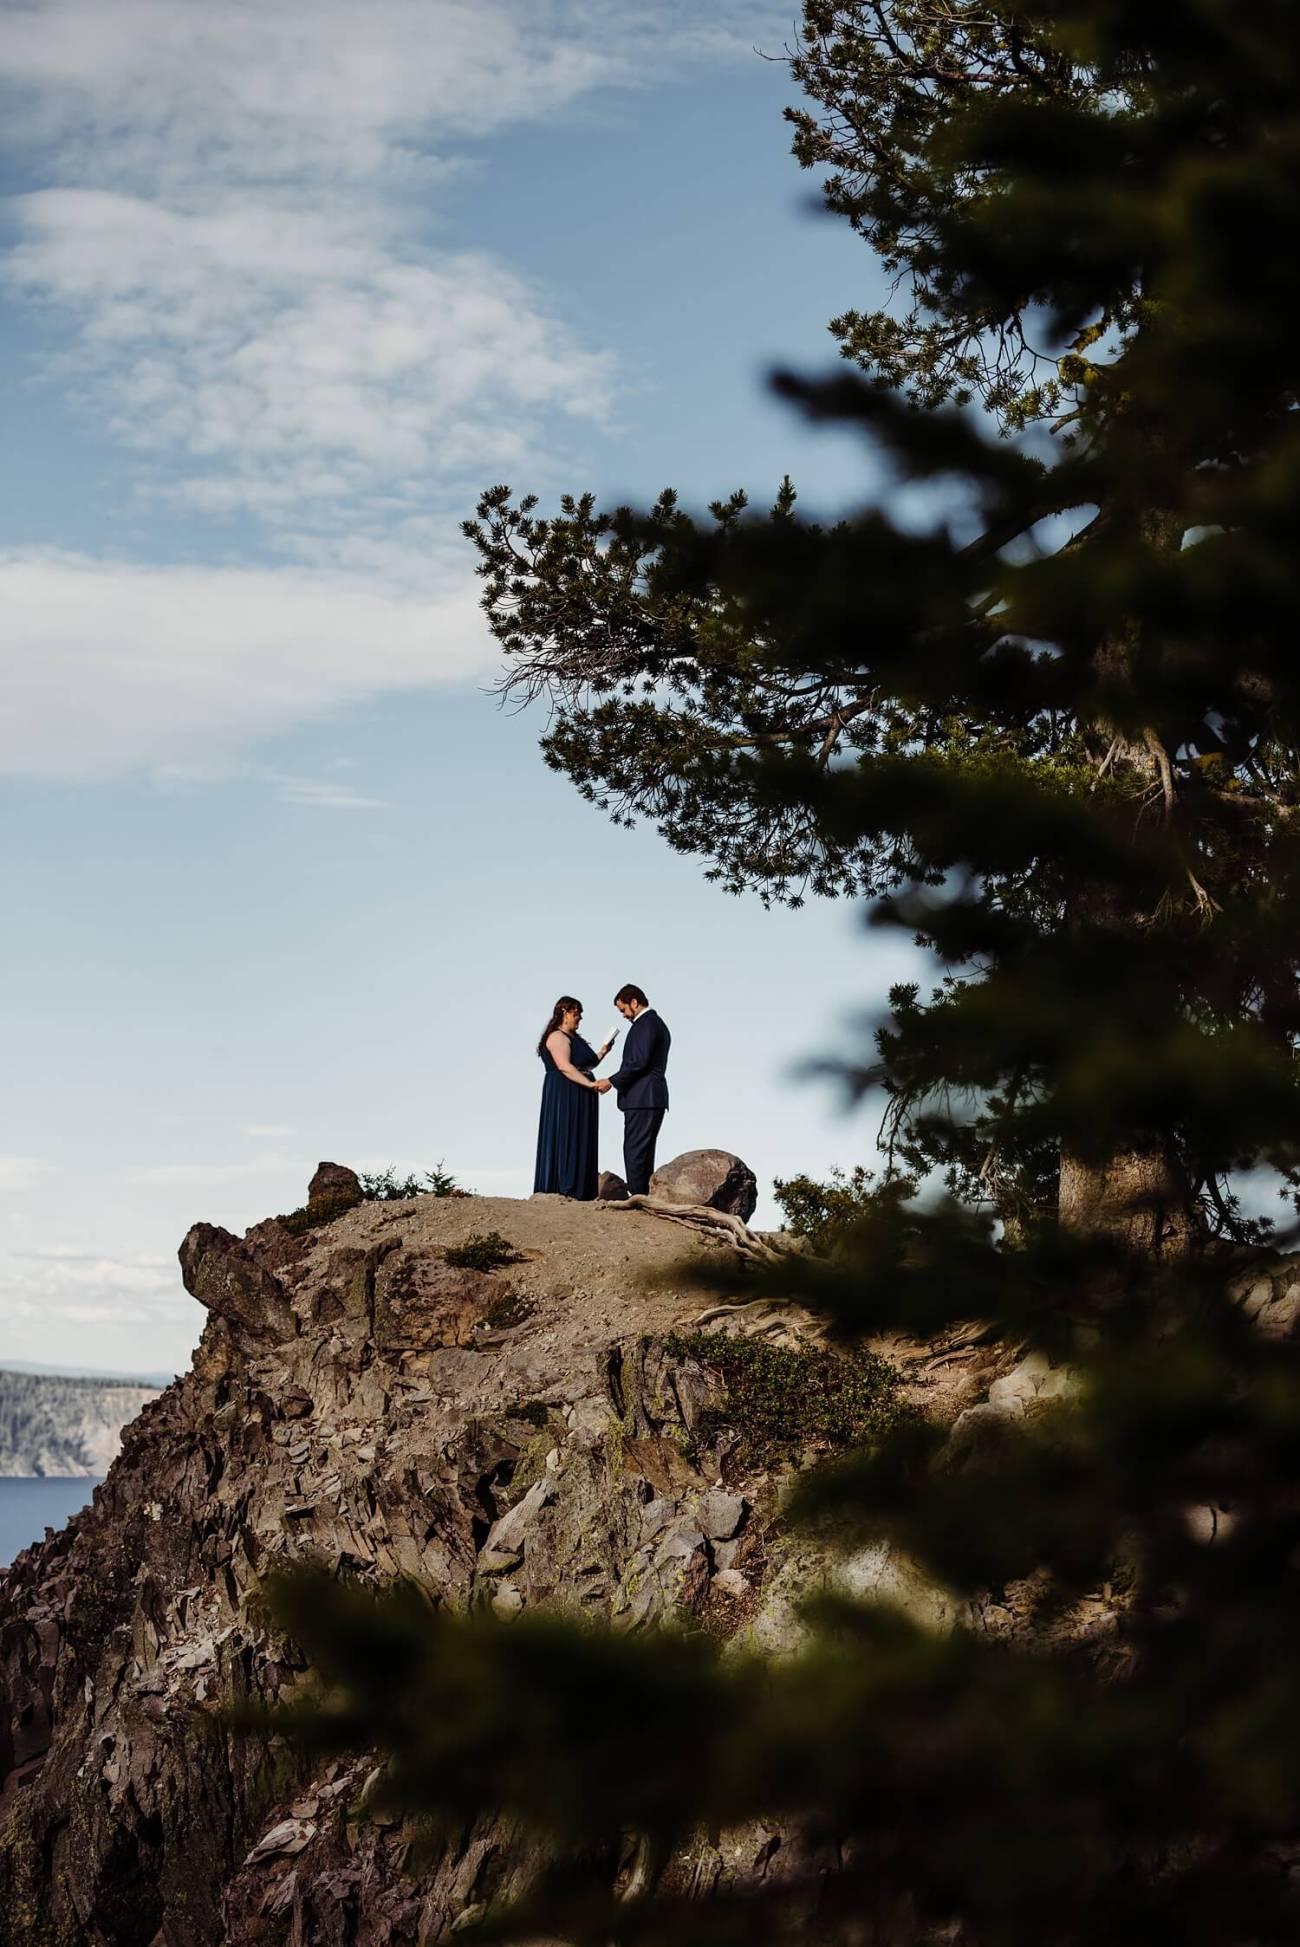 Crater Lake,adventure elopement photographer,adventure photographer,adventure session,elope,elopement,intimate wedding,jesse butler,kim butler,national park,oregon,pacific northwest,sam starns,vow renewal,